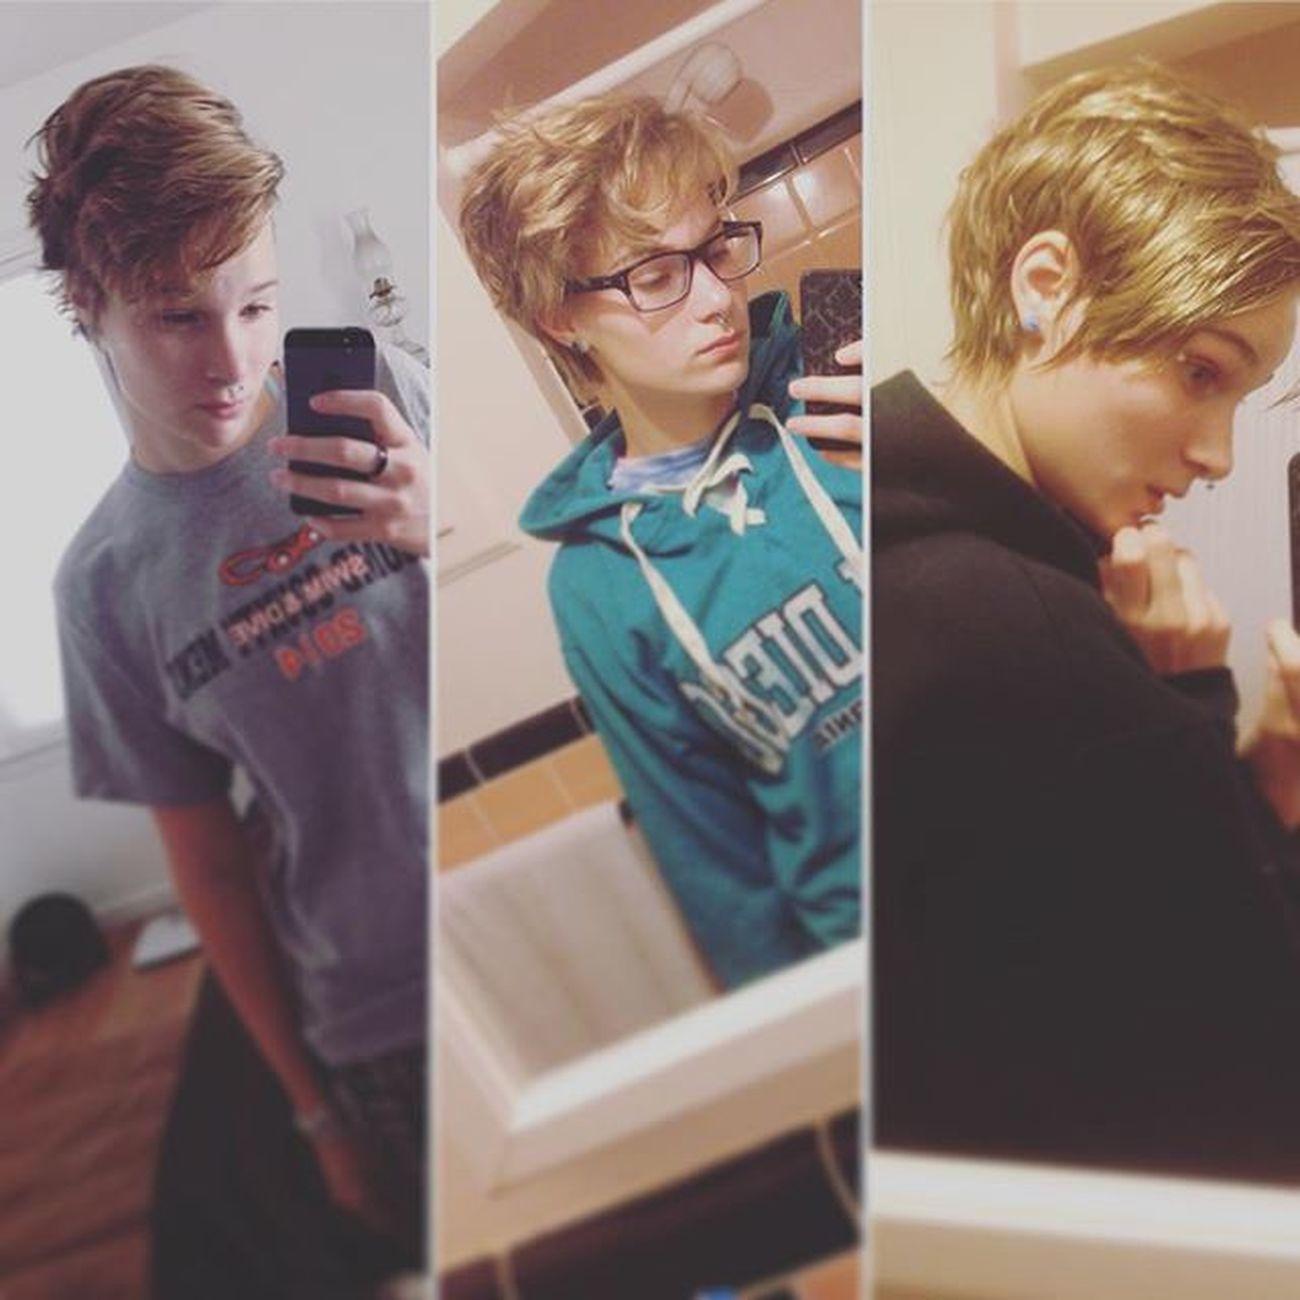 Look how long my hair has gotten!!! Selfie Mirrorselfie Hair Length Oh Okay Month Hairgrowth Me Progress Yay Growing Hairlength Shorthair Growinghairout Hairgrowingout Hairgrowinglonger Hairgrowinglikecrazy Alywashere